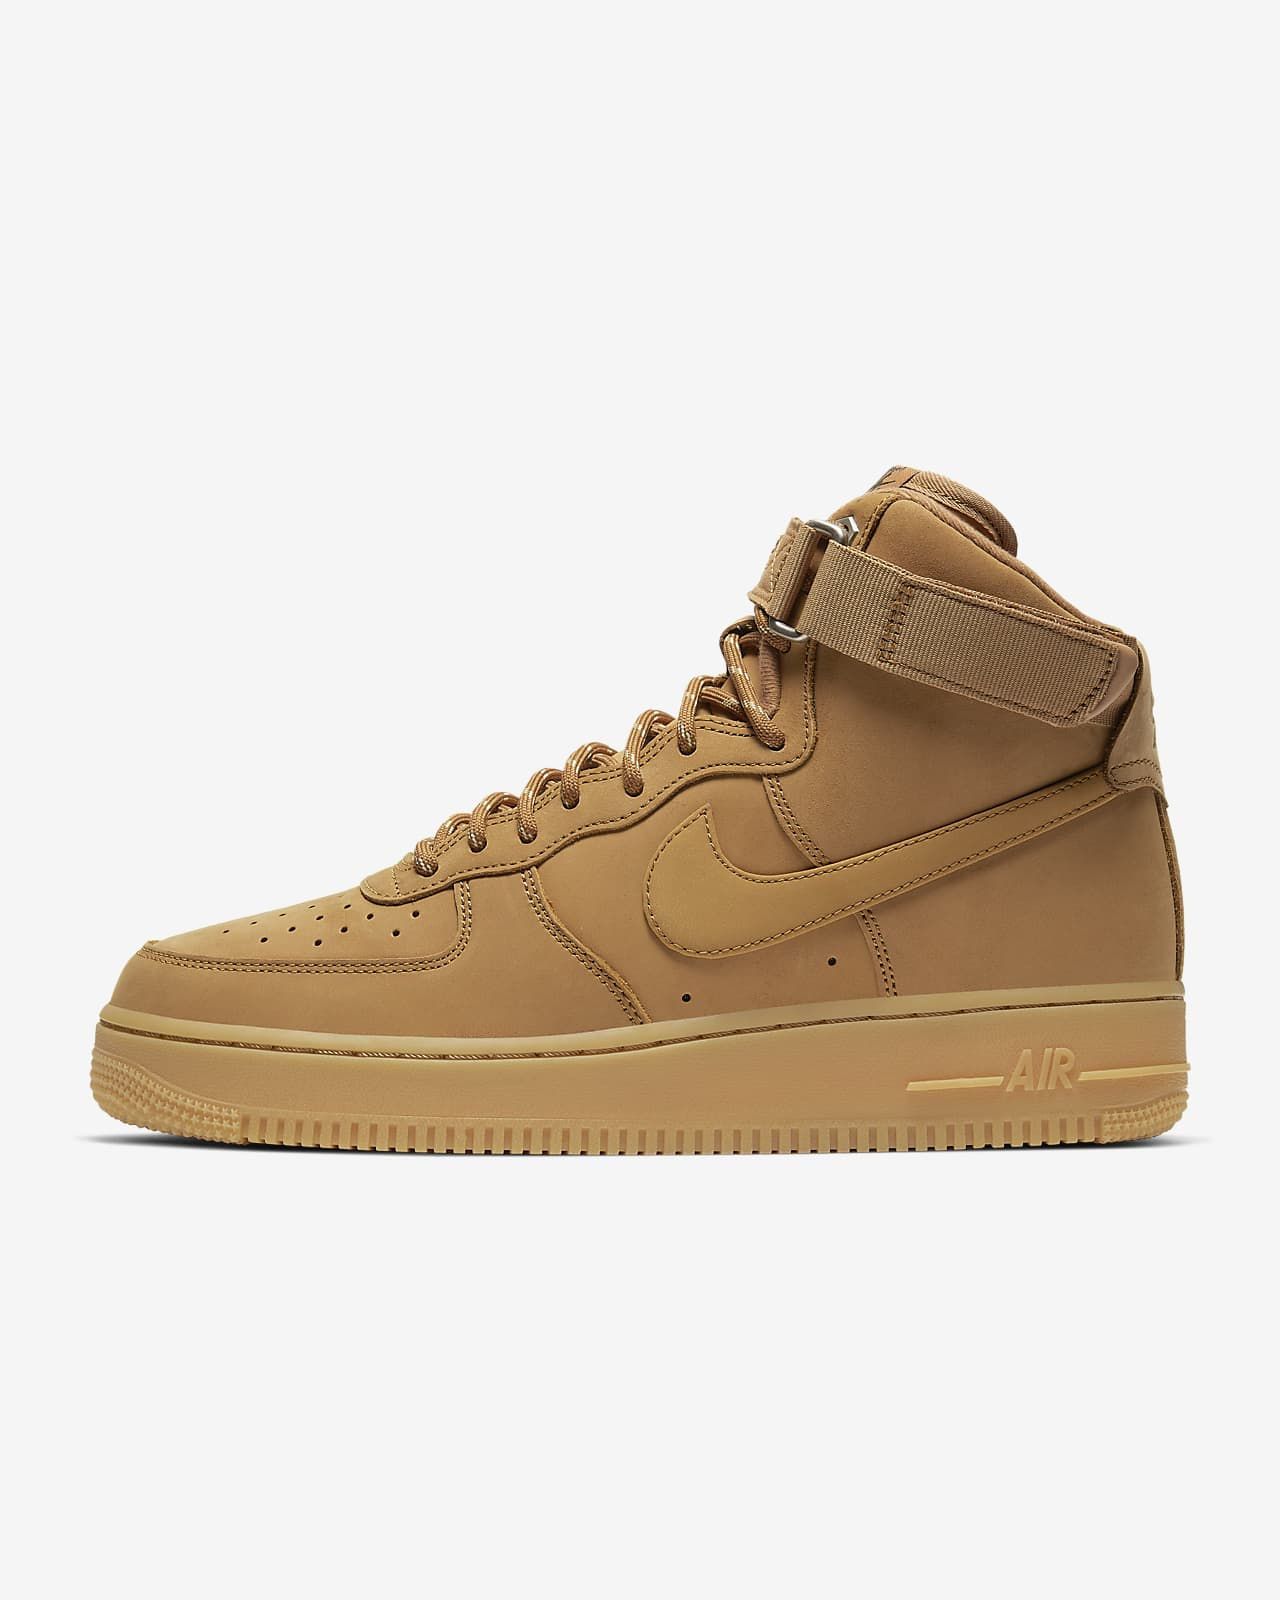 Nike Air Force 1 High '07 Men's Shoe